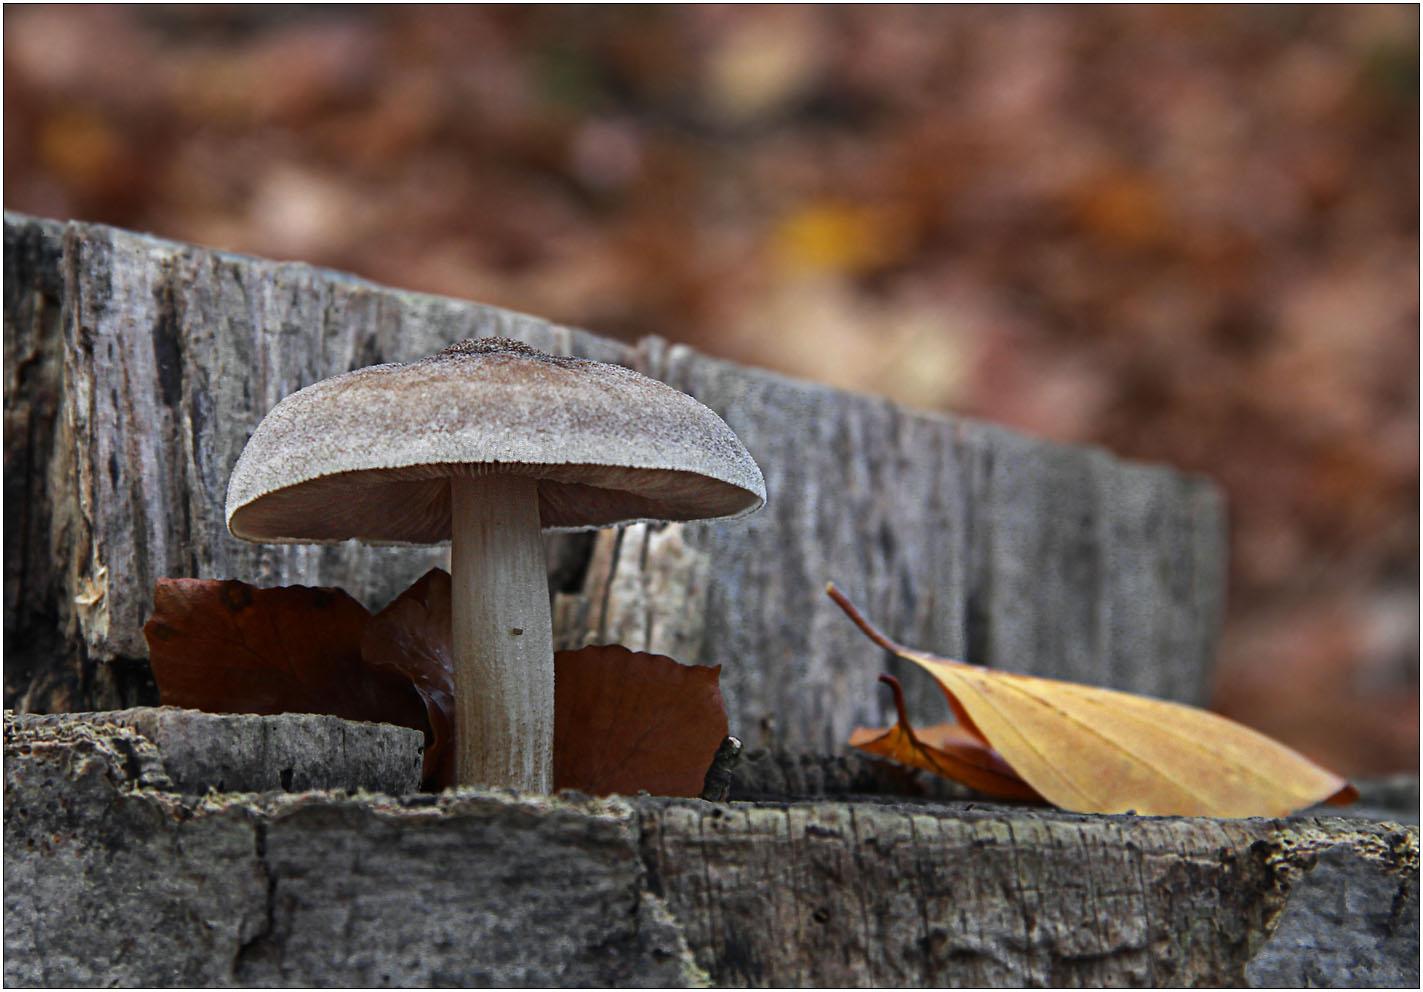 Grauer Pilz auf grauem Holz